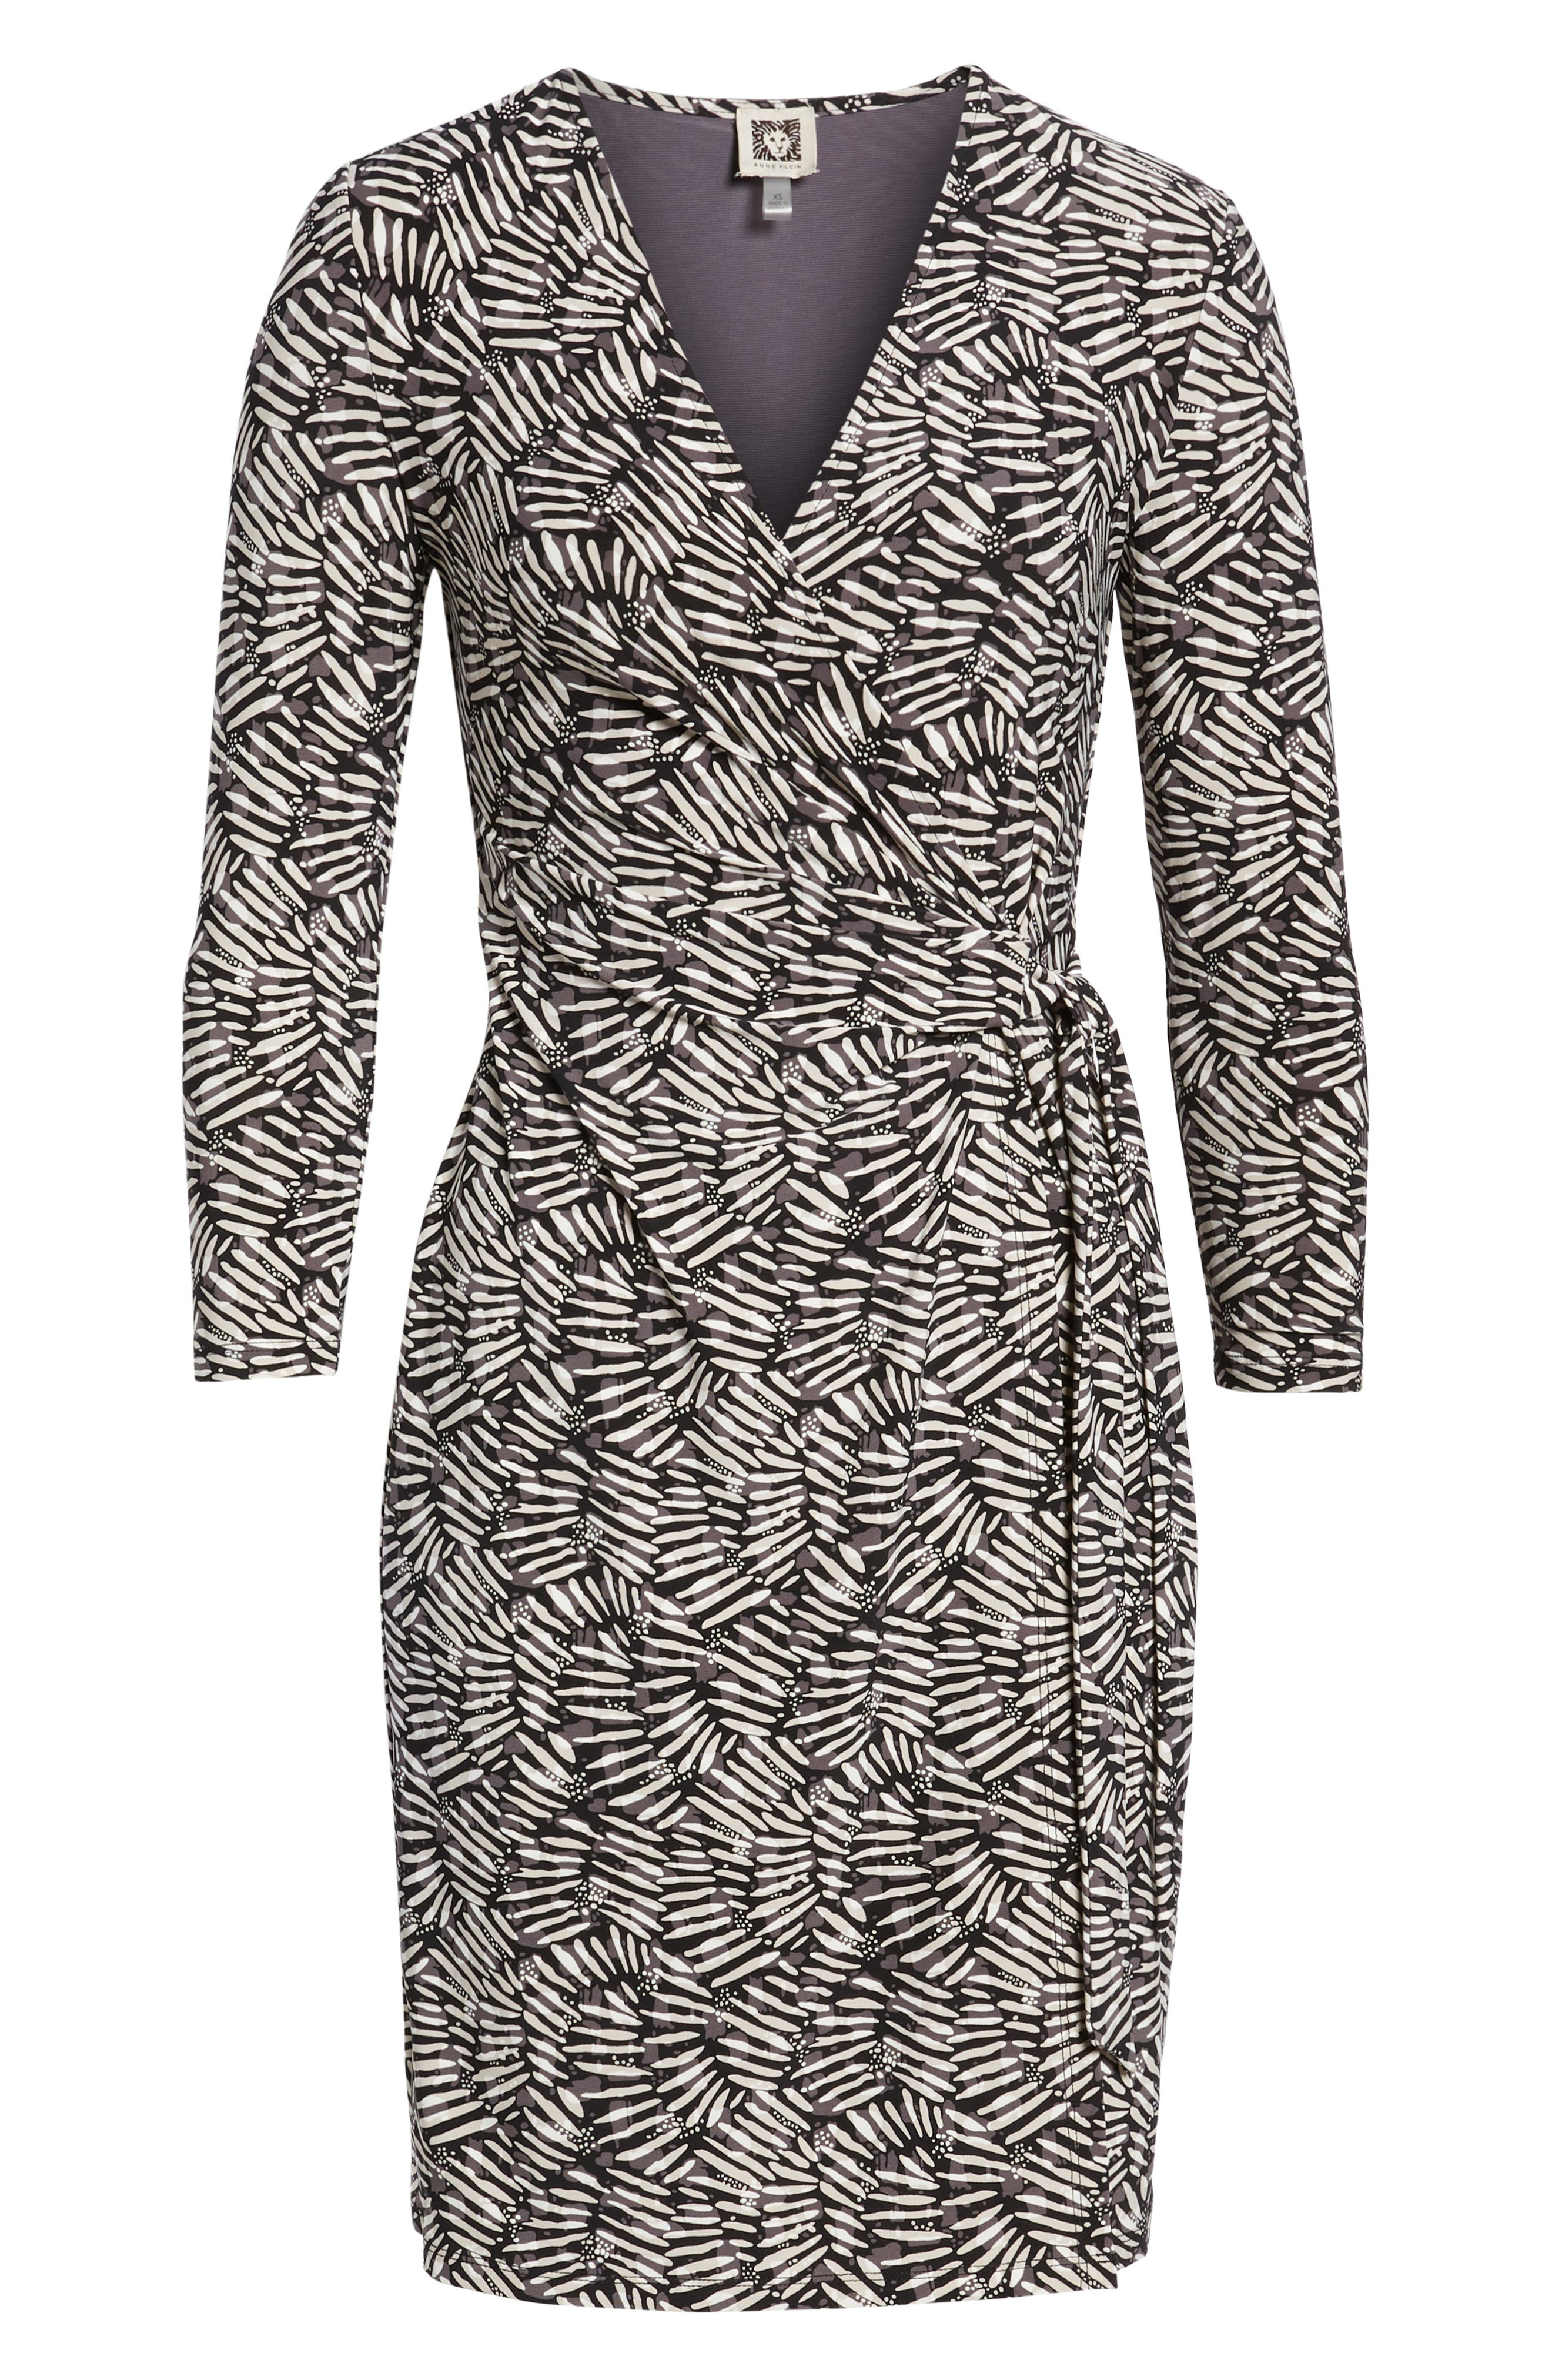 Cedarwood Stretch Crepe Faux Wrap Dress,                             Alternate thumbnail 6, color,                             001